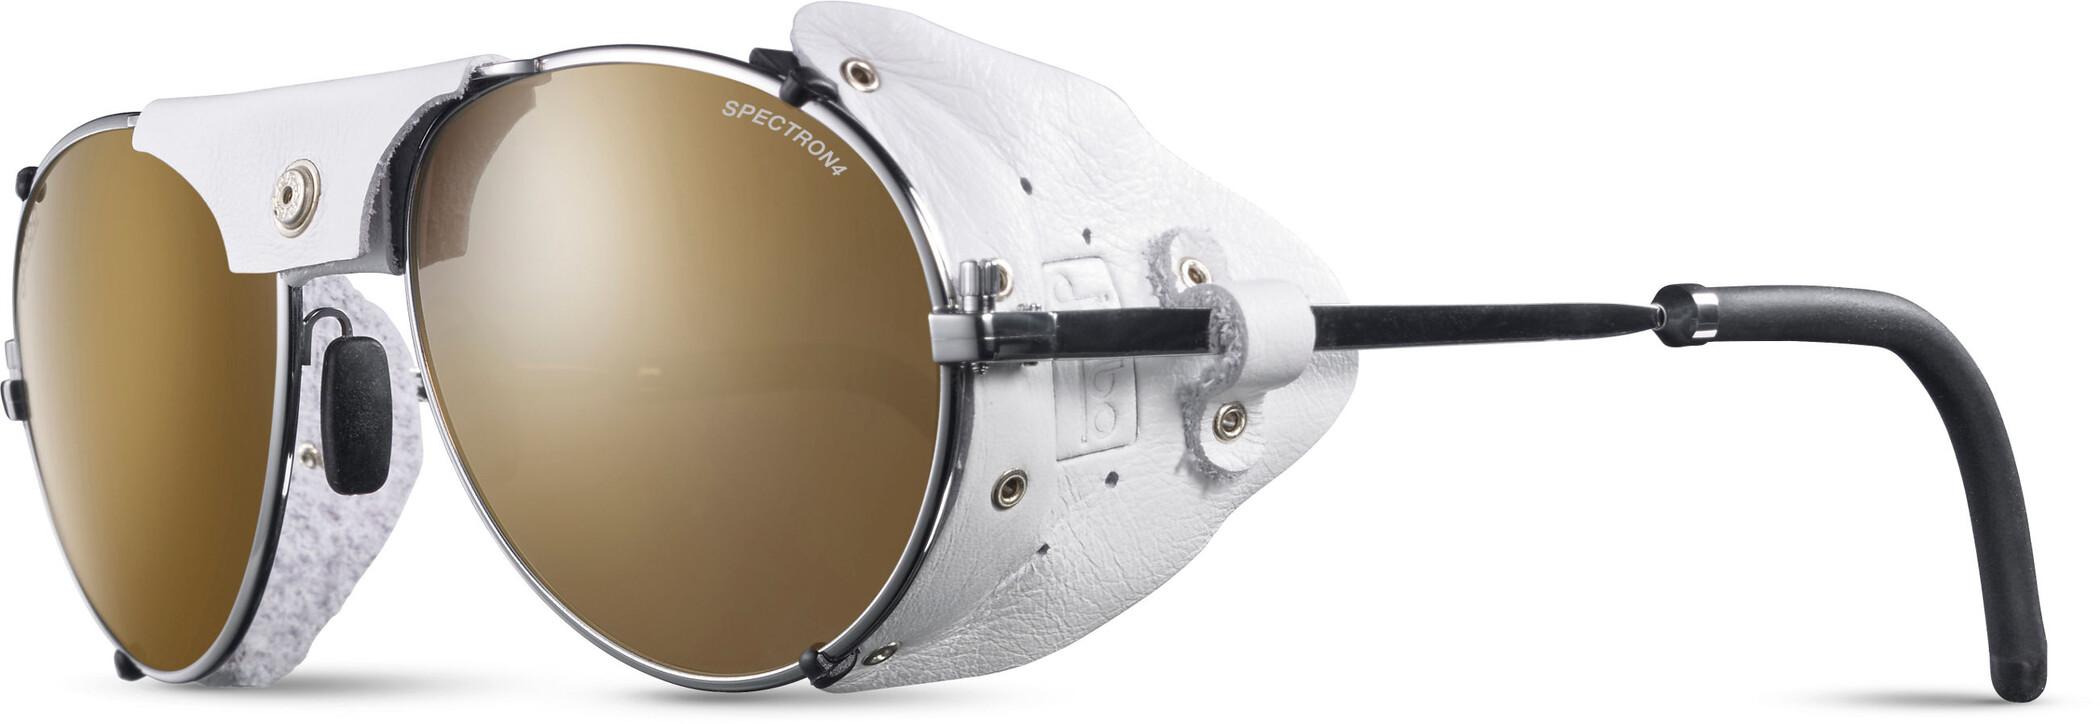 Julbo Cham Spectron 4 Solbriller, chrome/white-brown flash silver (2020) | Glasses